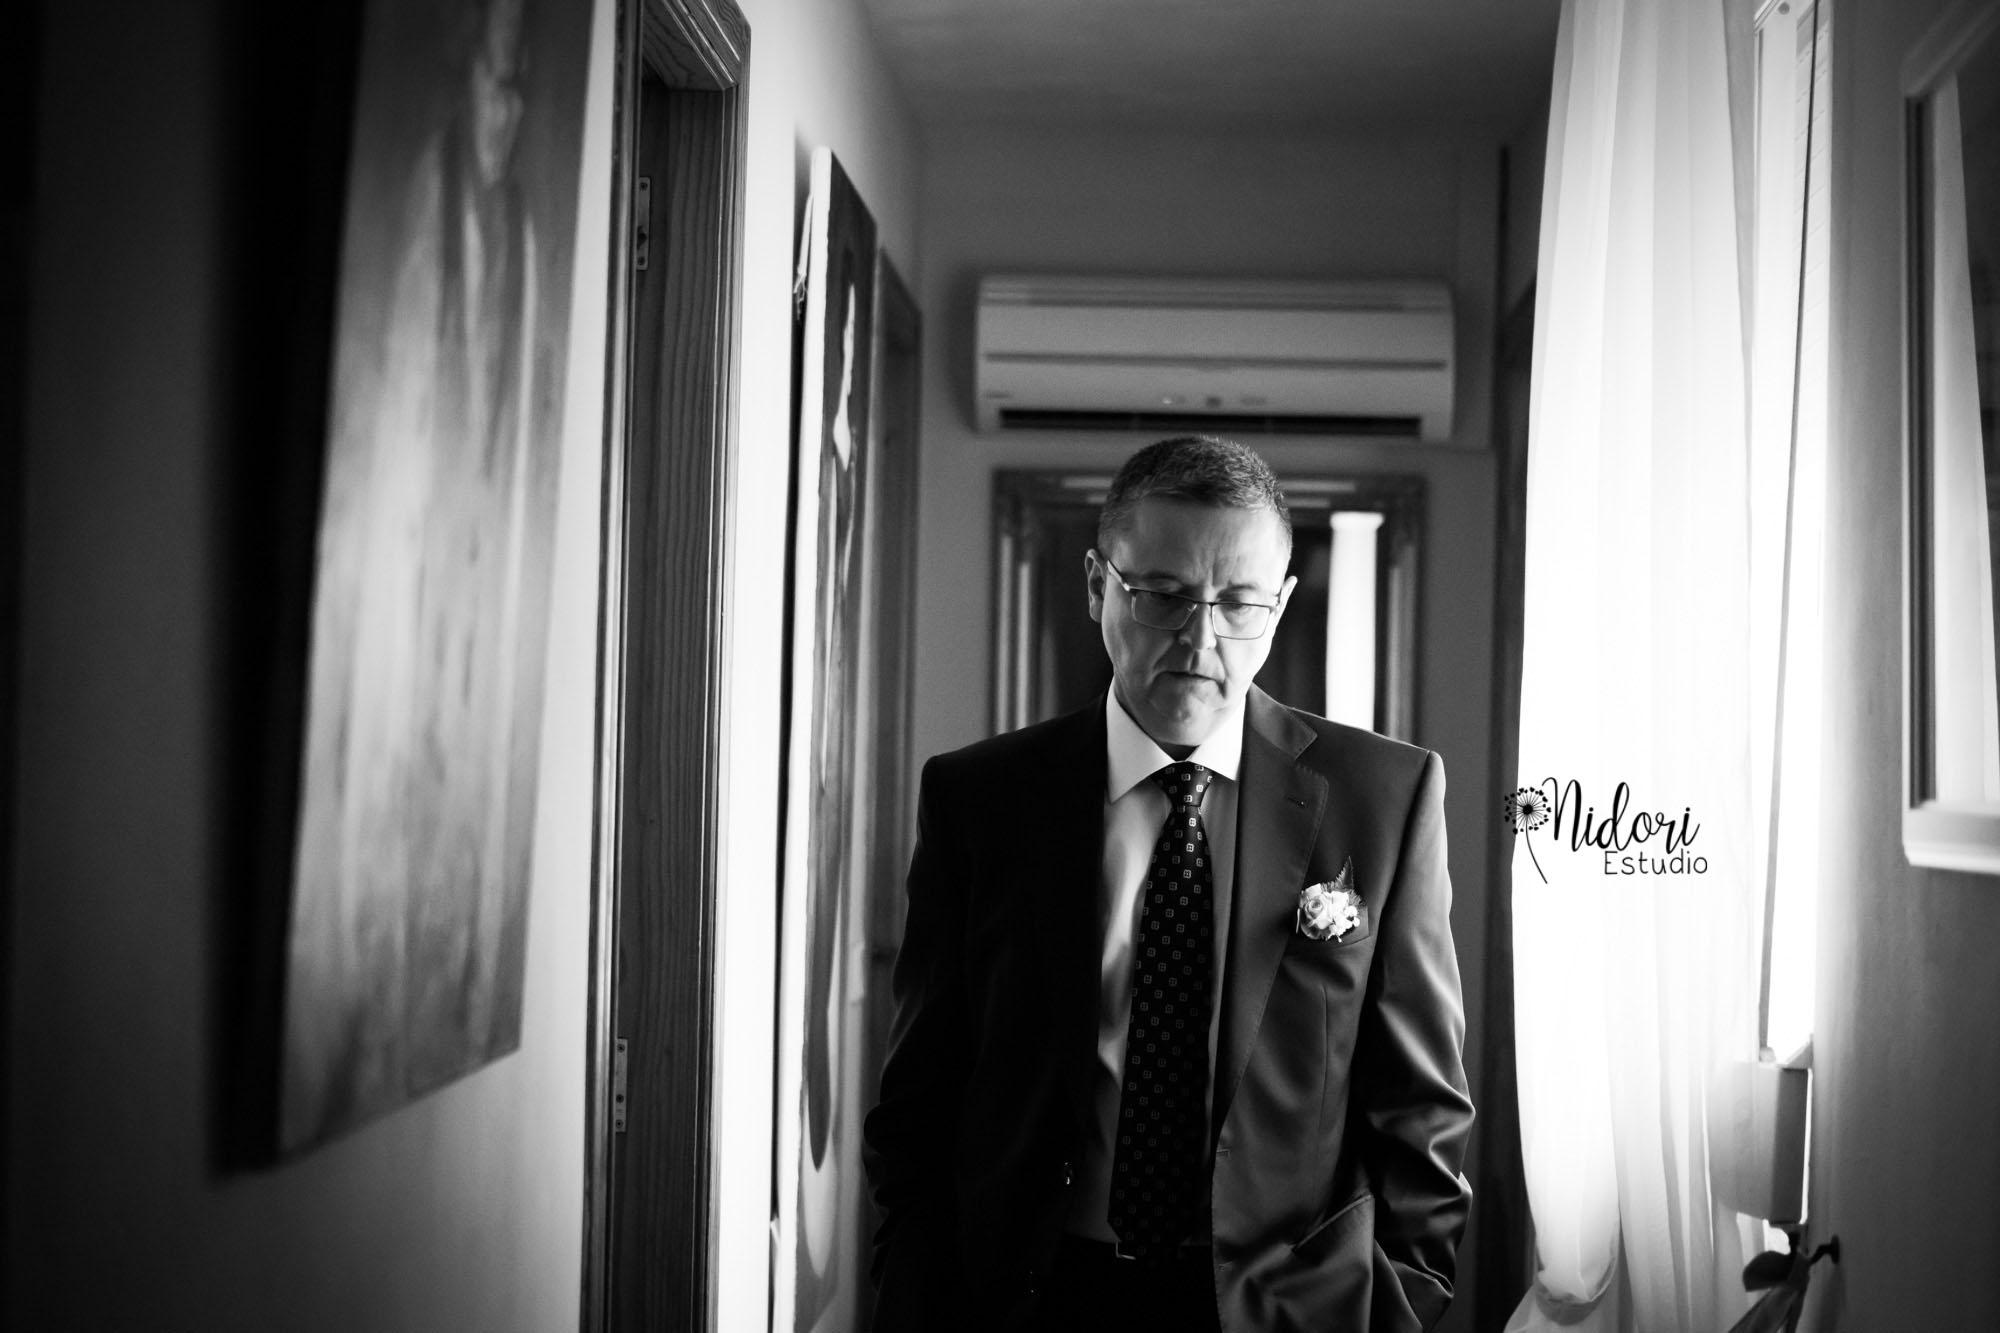 fotos-de-boda-reportaje-novios-fotografia-boda-nidoriestudio-fotos-valencia-almazora-castellon-españa-spain-009